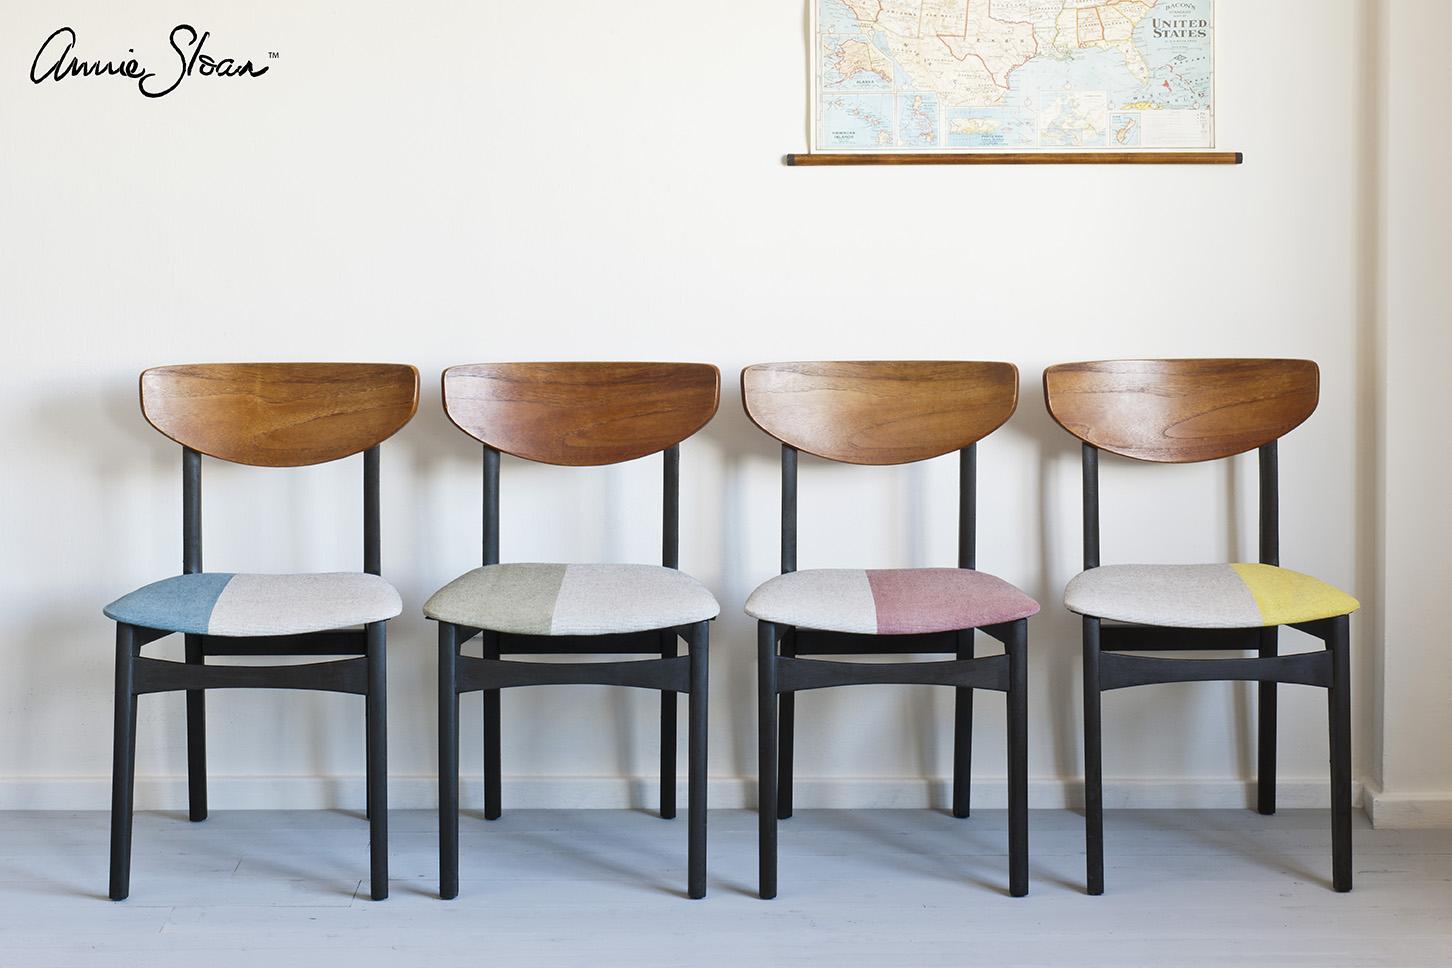 Annie Sloan  Paint & Colour: Mid-Century Modern Chairs